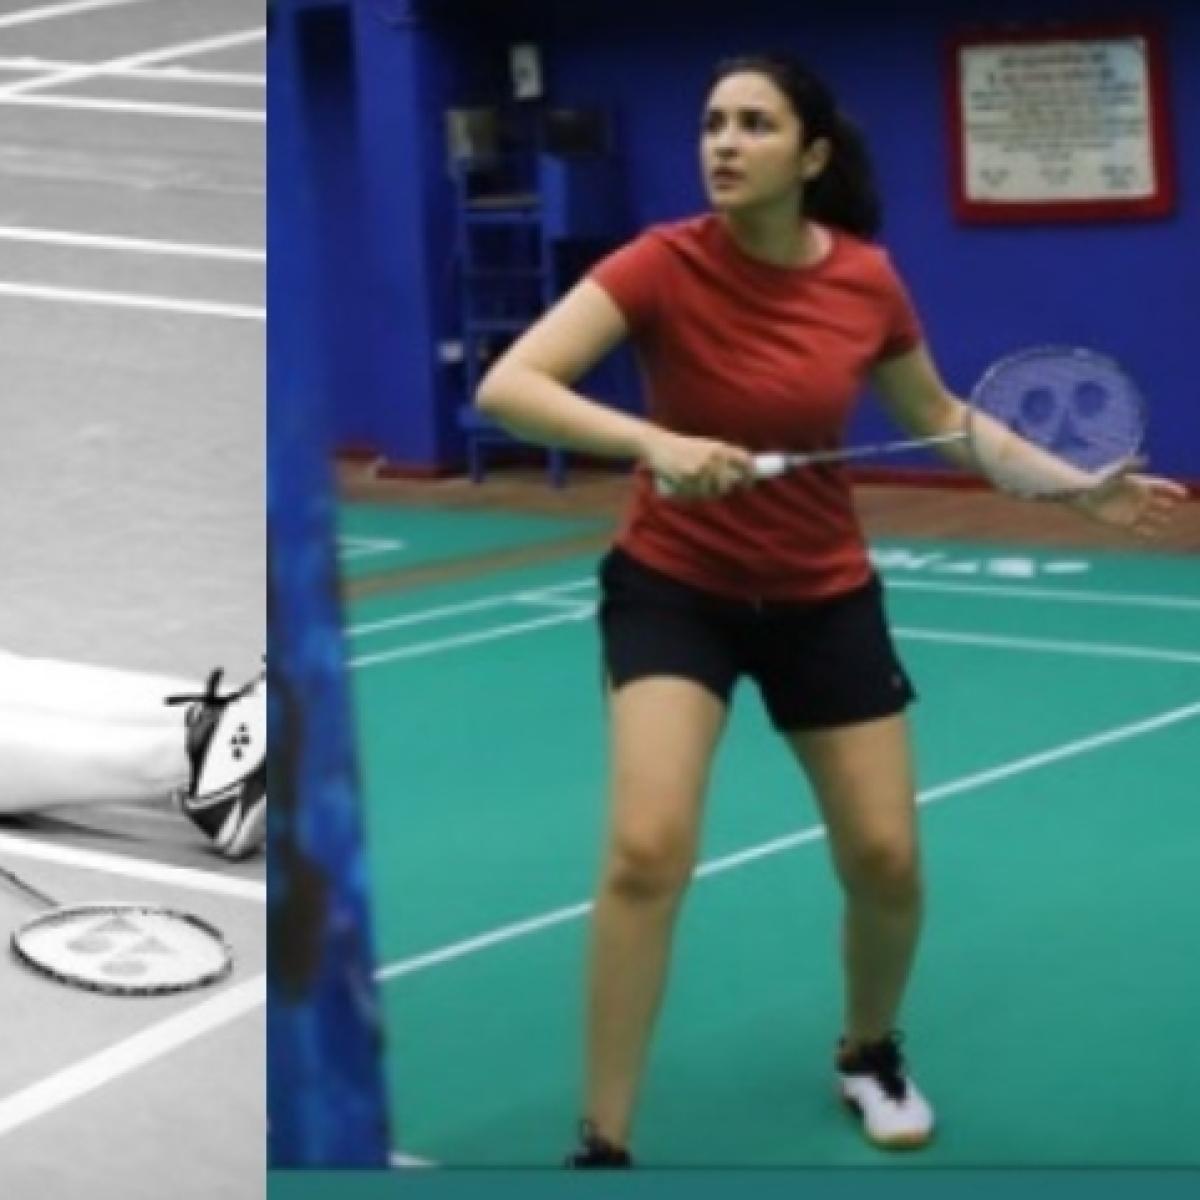 Parineeti Chopra documents her badminton training session post-injury